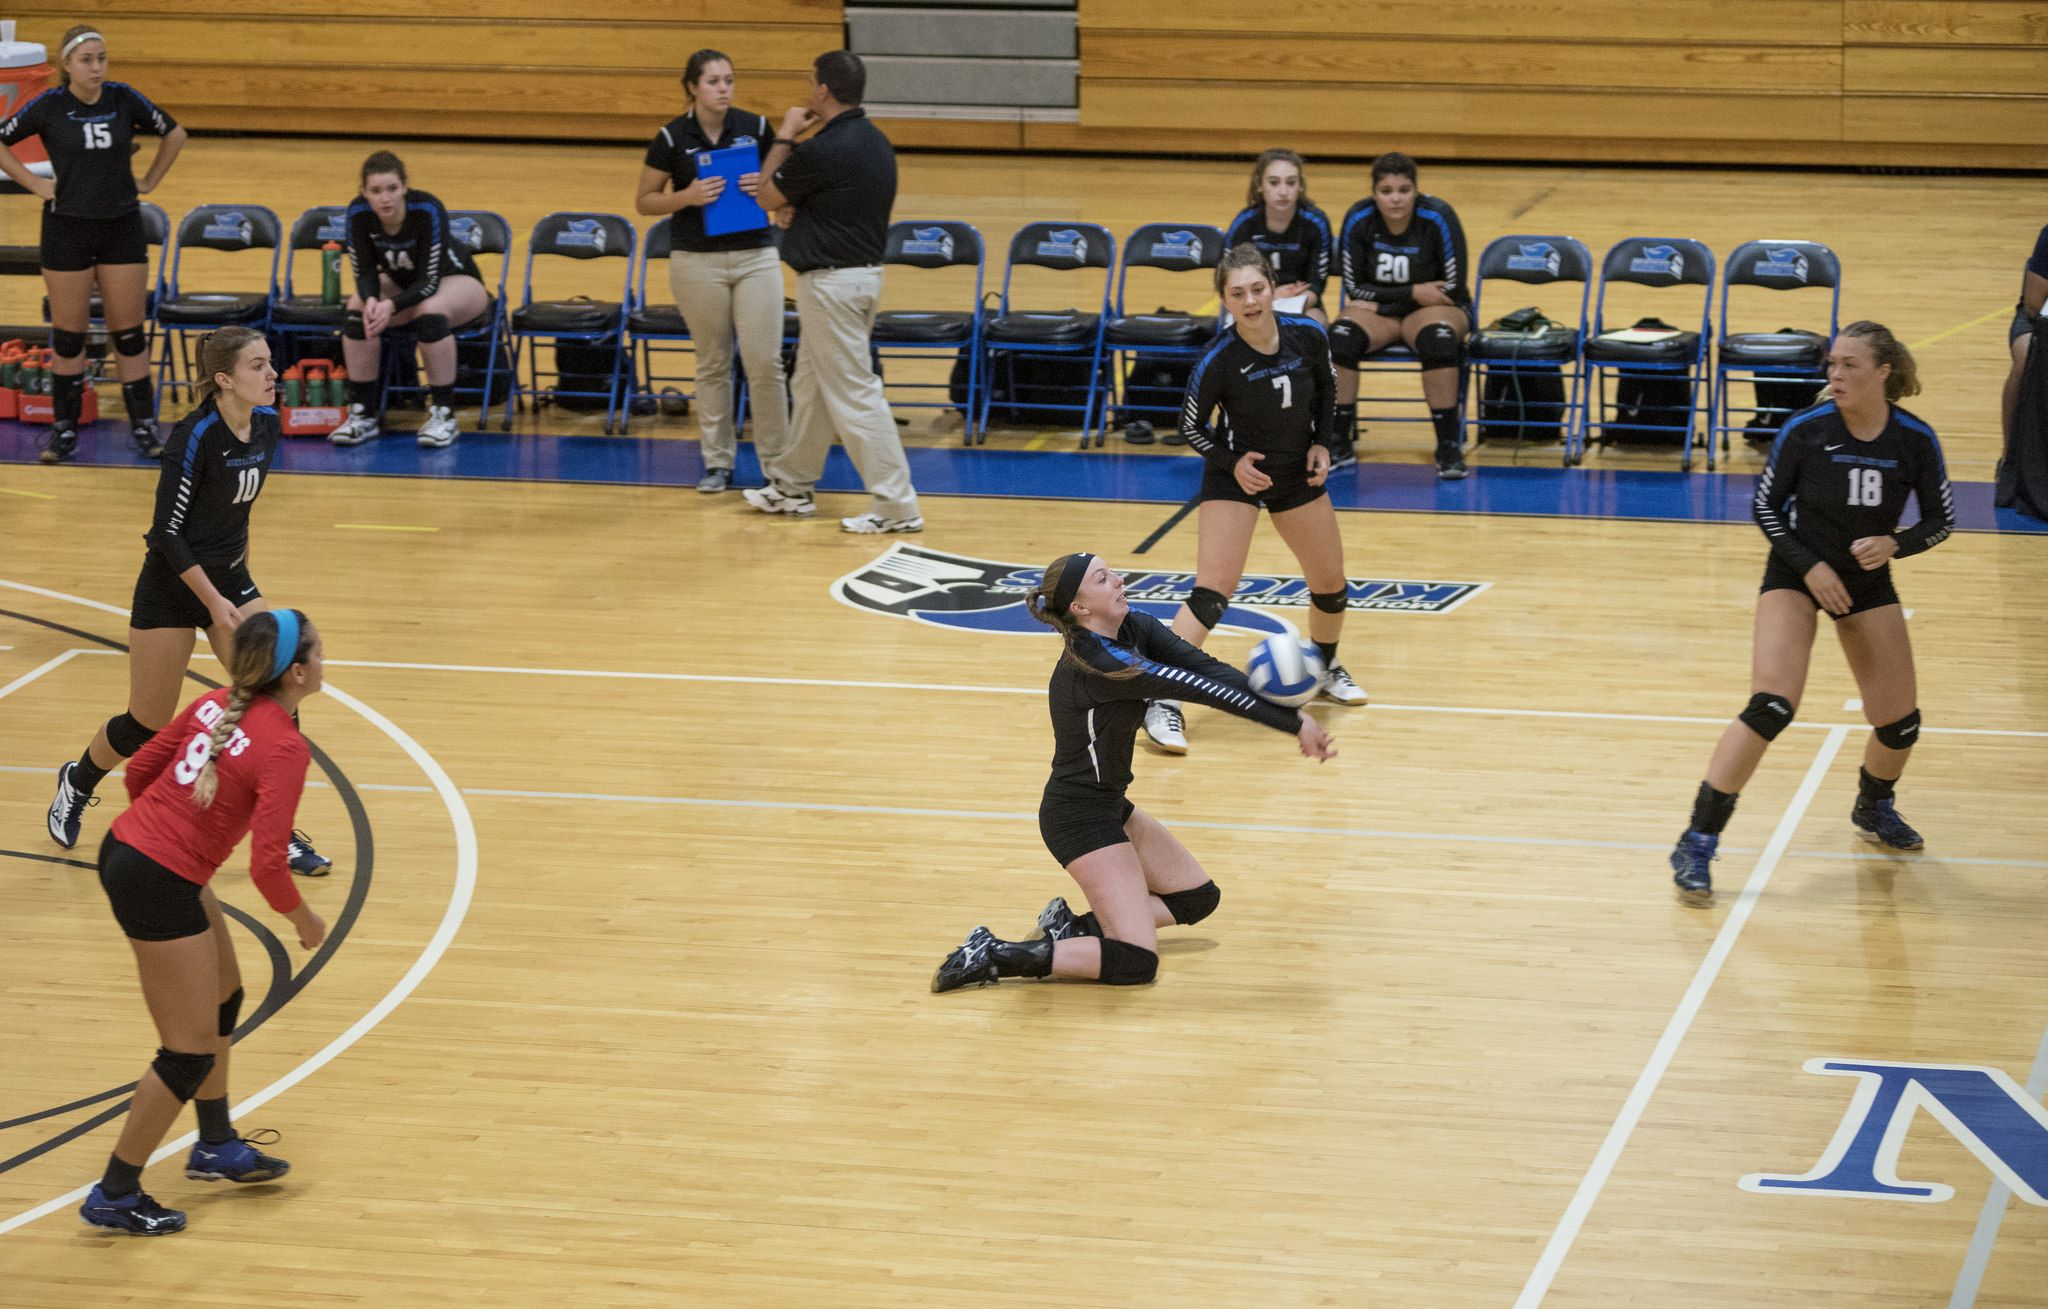 Sp Volleyball 9048 Women Volleyball Volleyball Team Volleyball